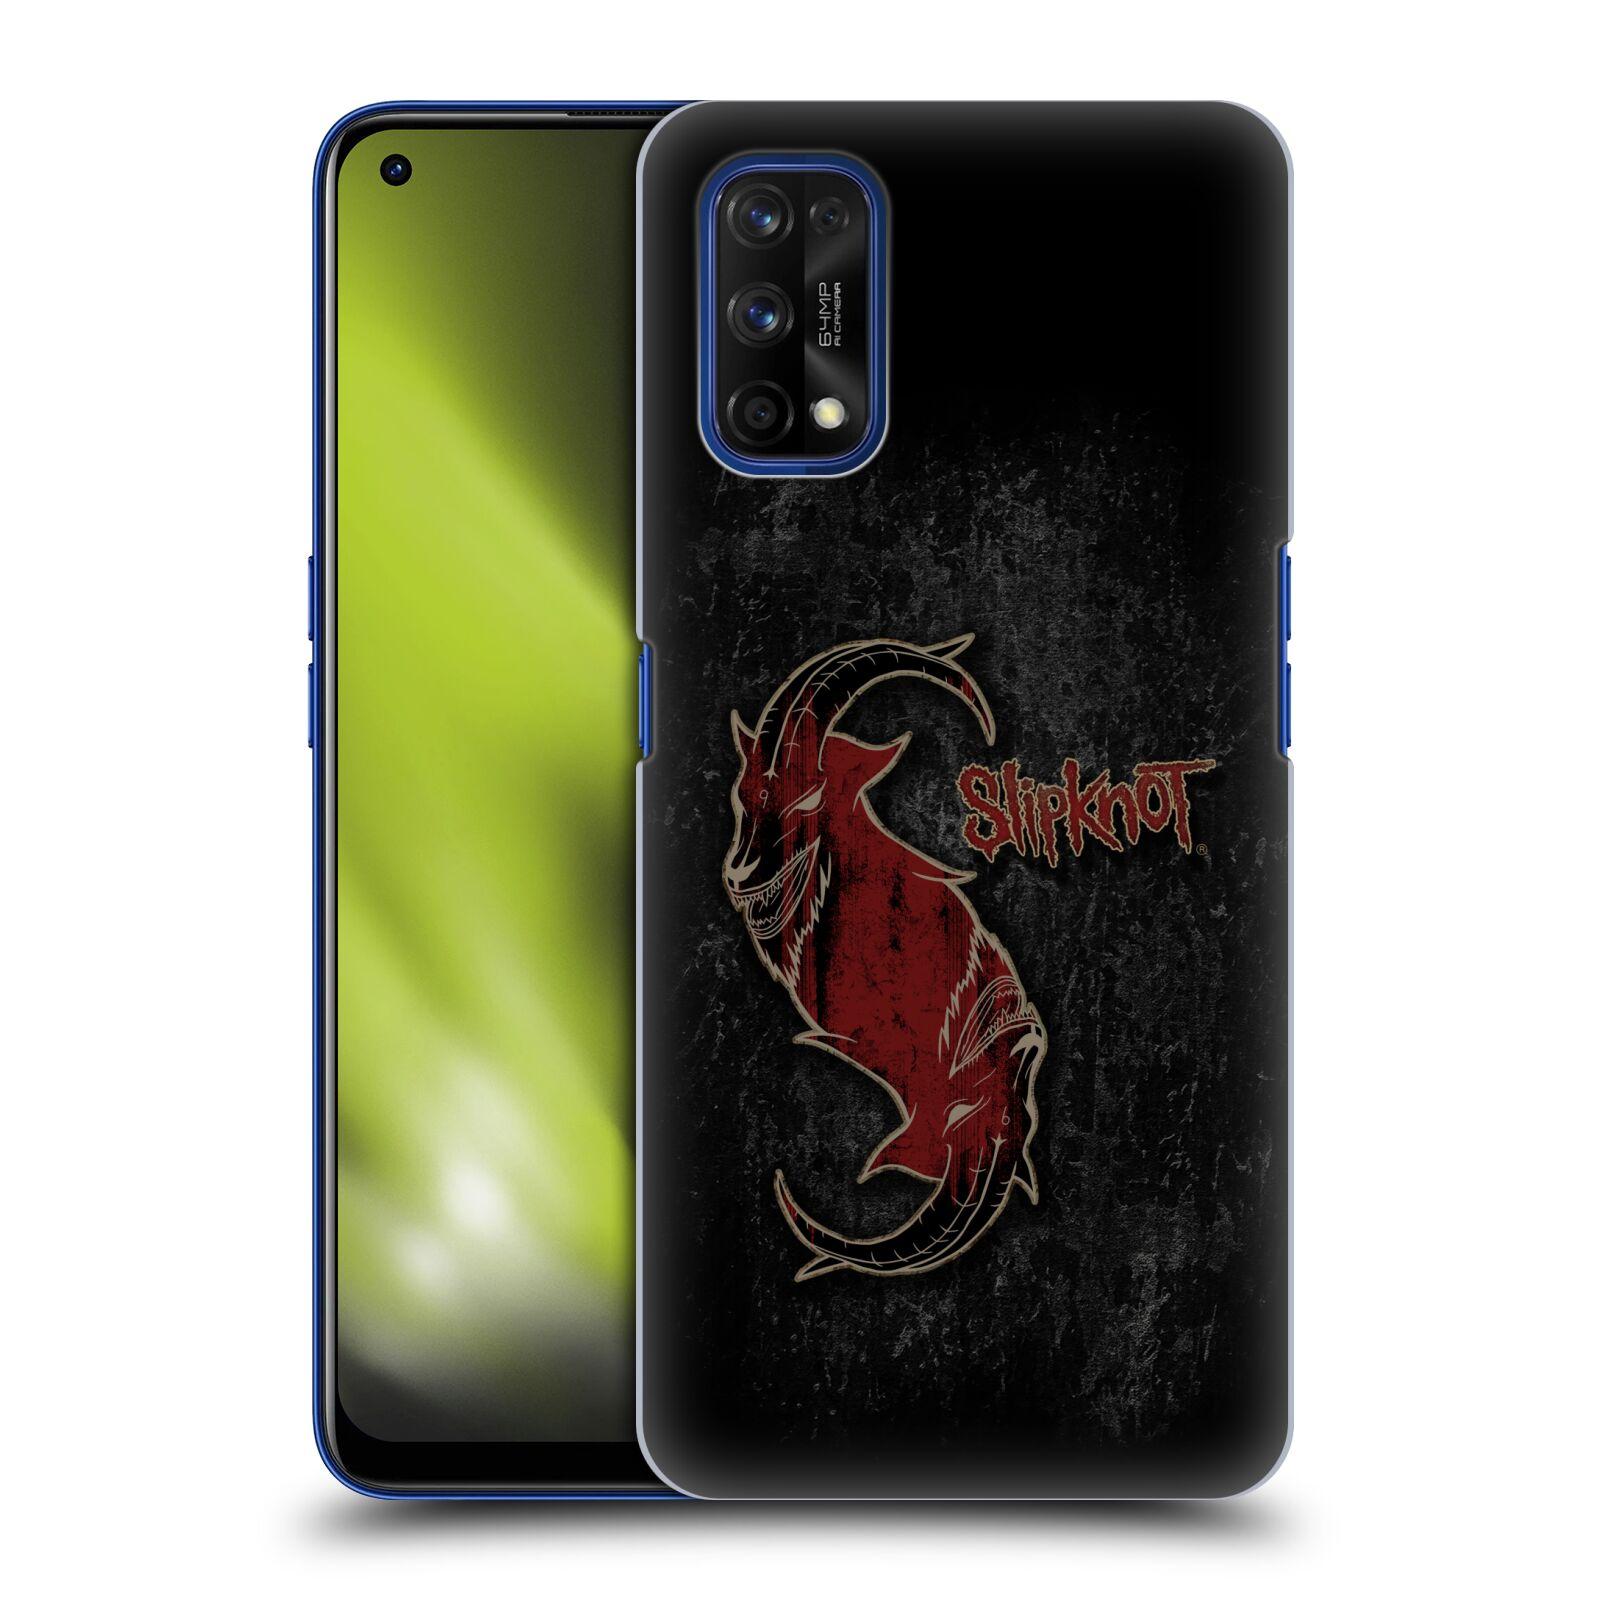 Plastové pouzdro na mobil Realme 7 Pro - Head Case - Slipknot - Rudý kozel